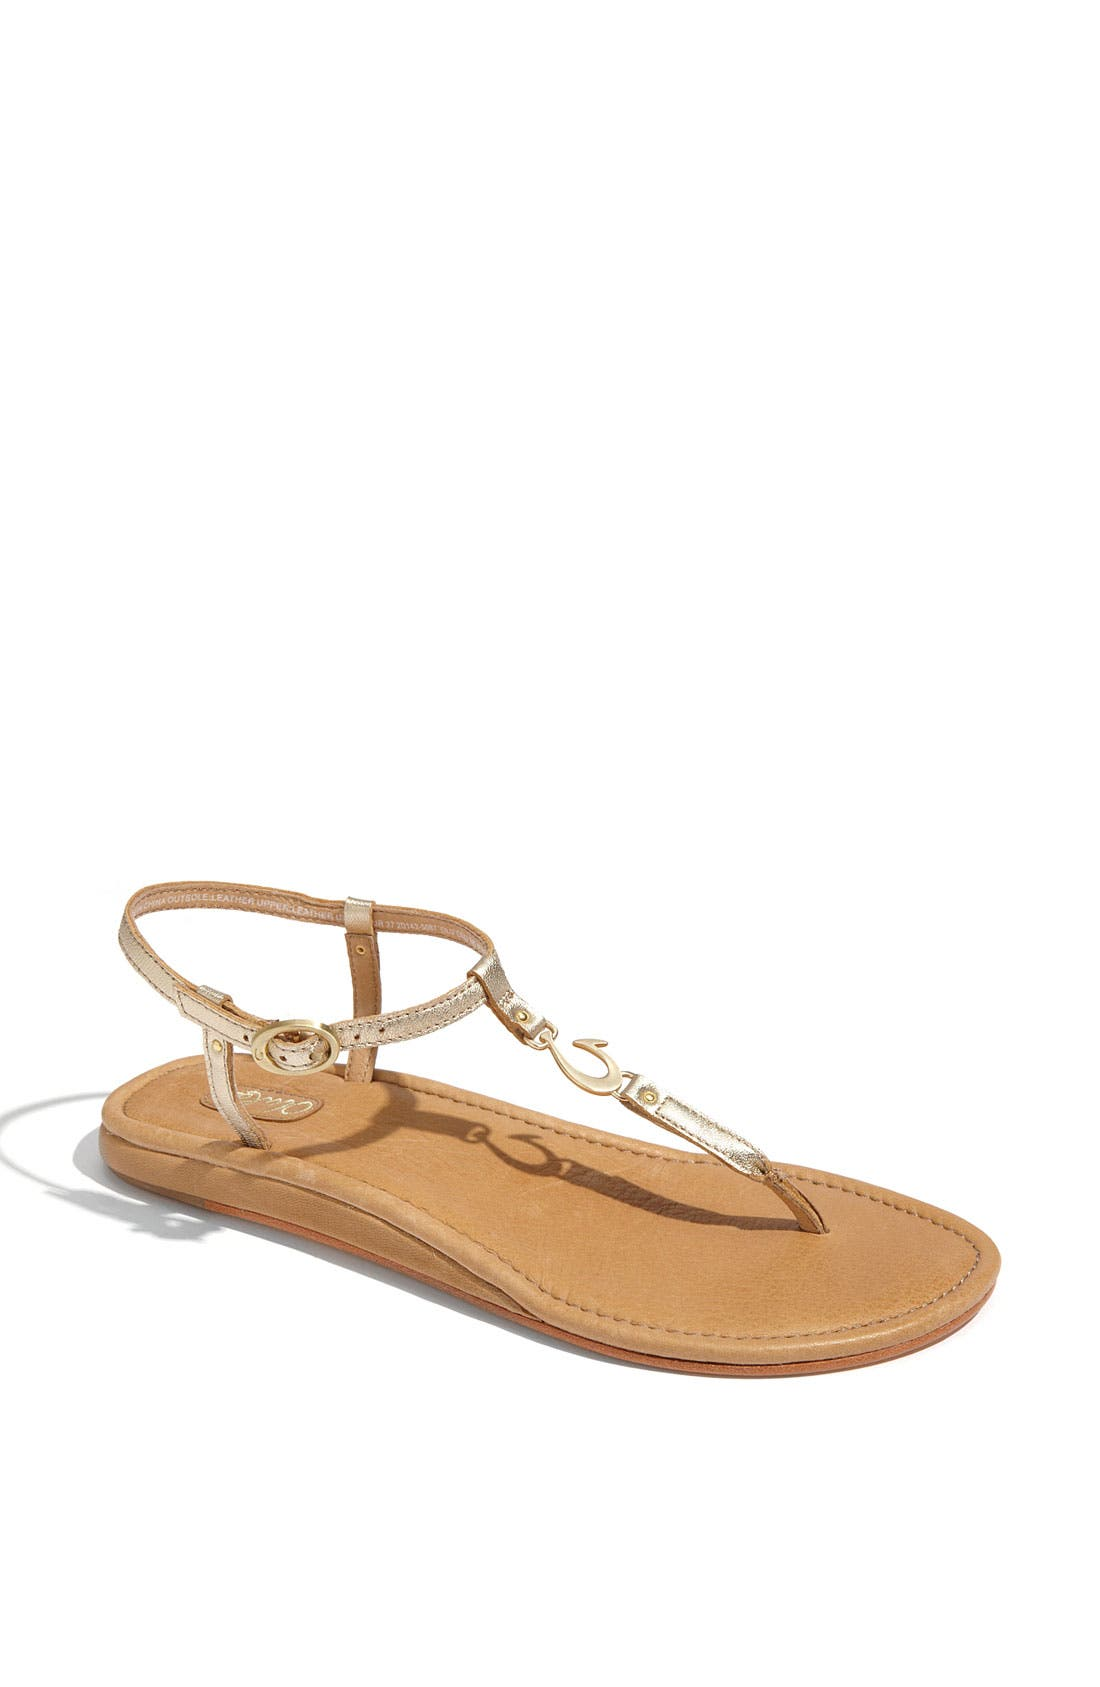 Alternate Image 1 Selected - OluKai 'Olu'Olu' Thong Sandal